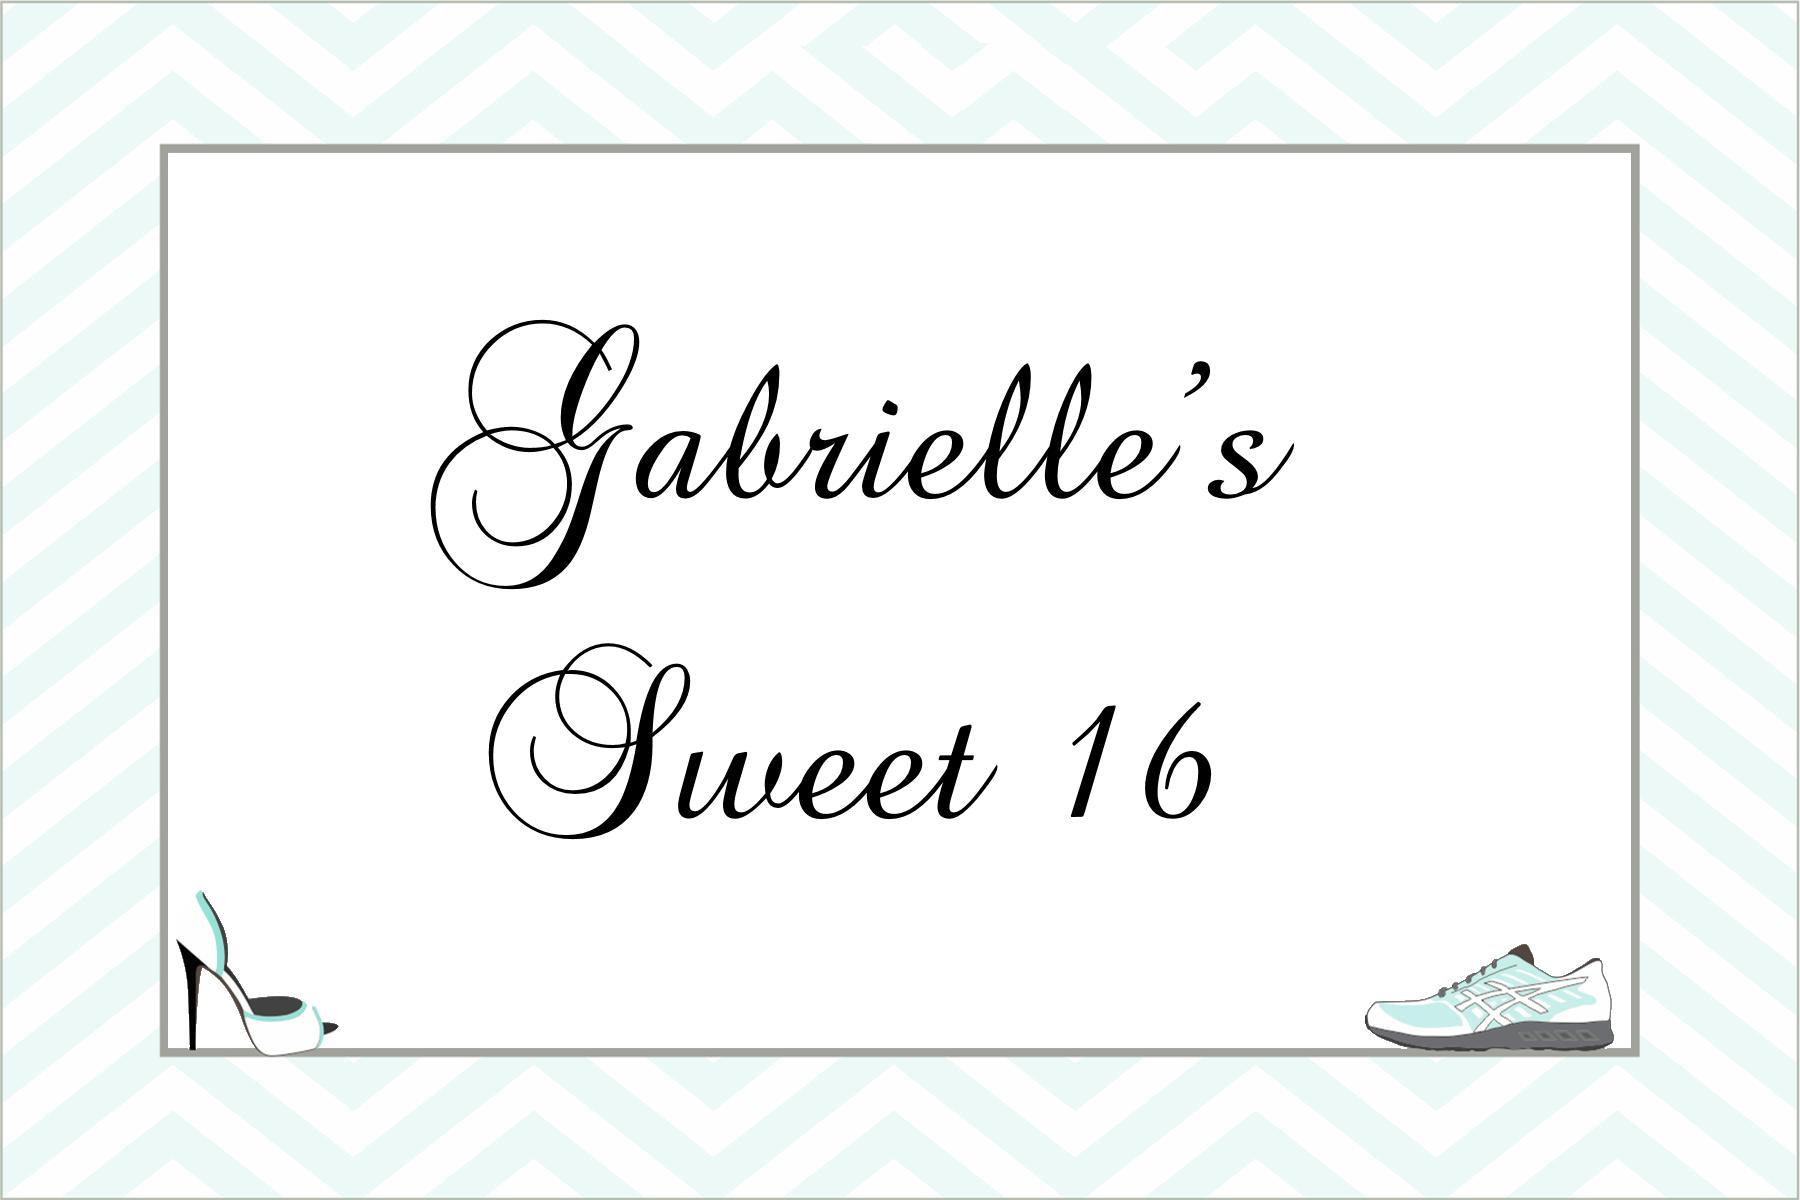 Gabriellesweet16